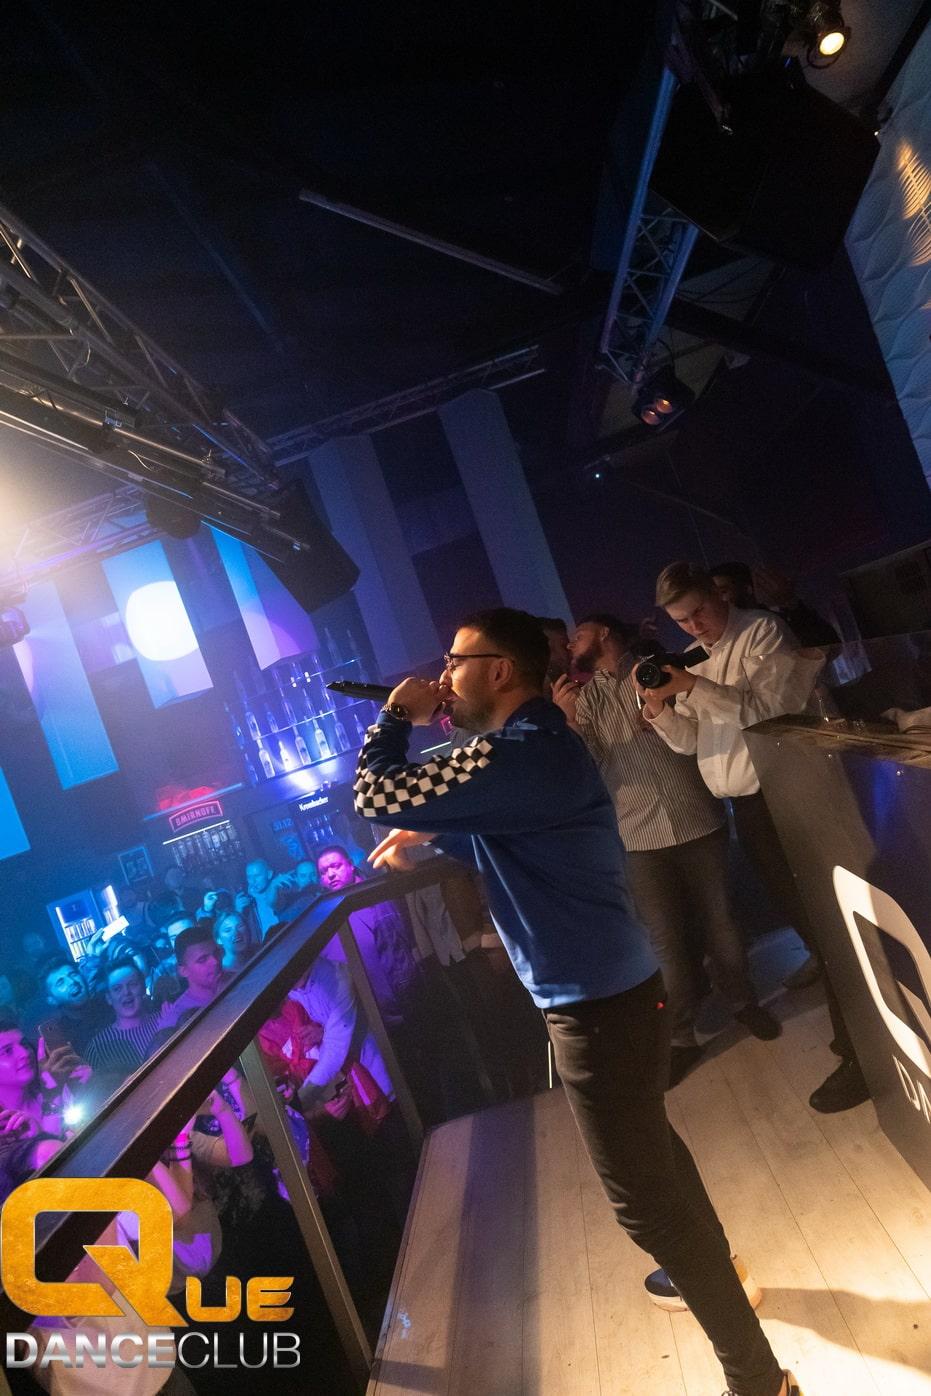 2018_12_08_Que_Danceclub_Paparazzo_Night_Ardian_Bujupi_Live_Nightlife_Scene_Timo_049